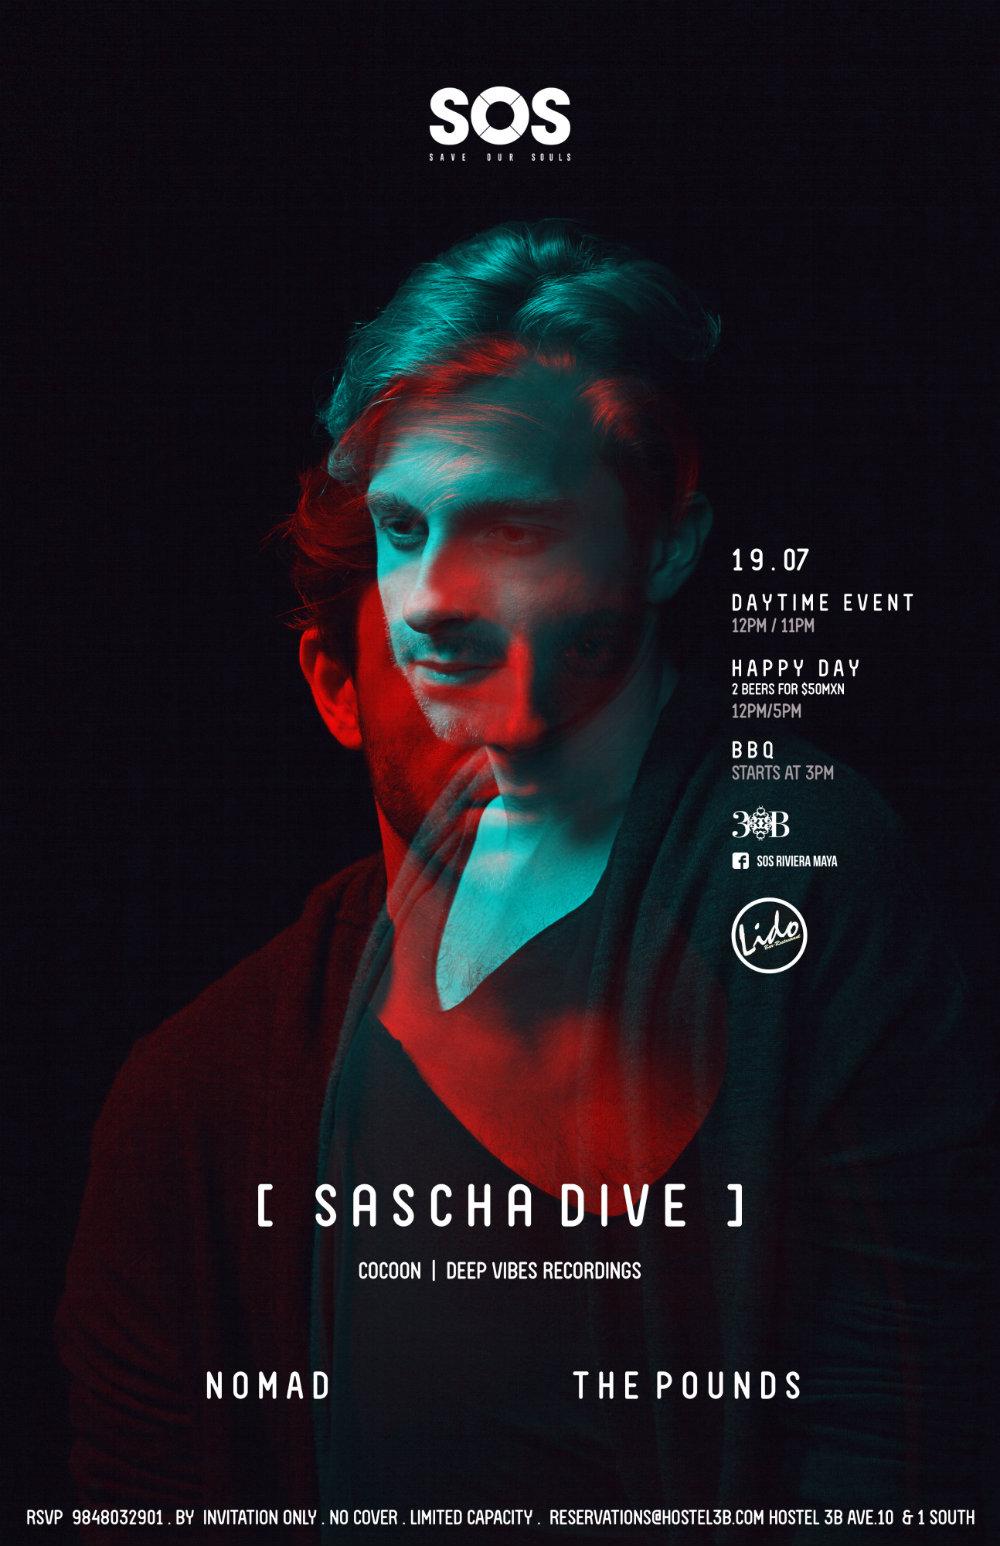 Sascha Dive @ SOS Lounge - Playa del Carmen